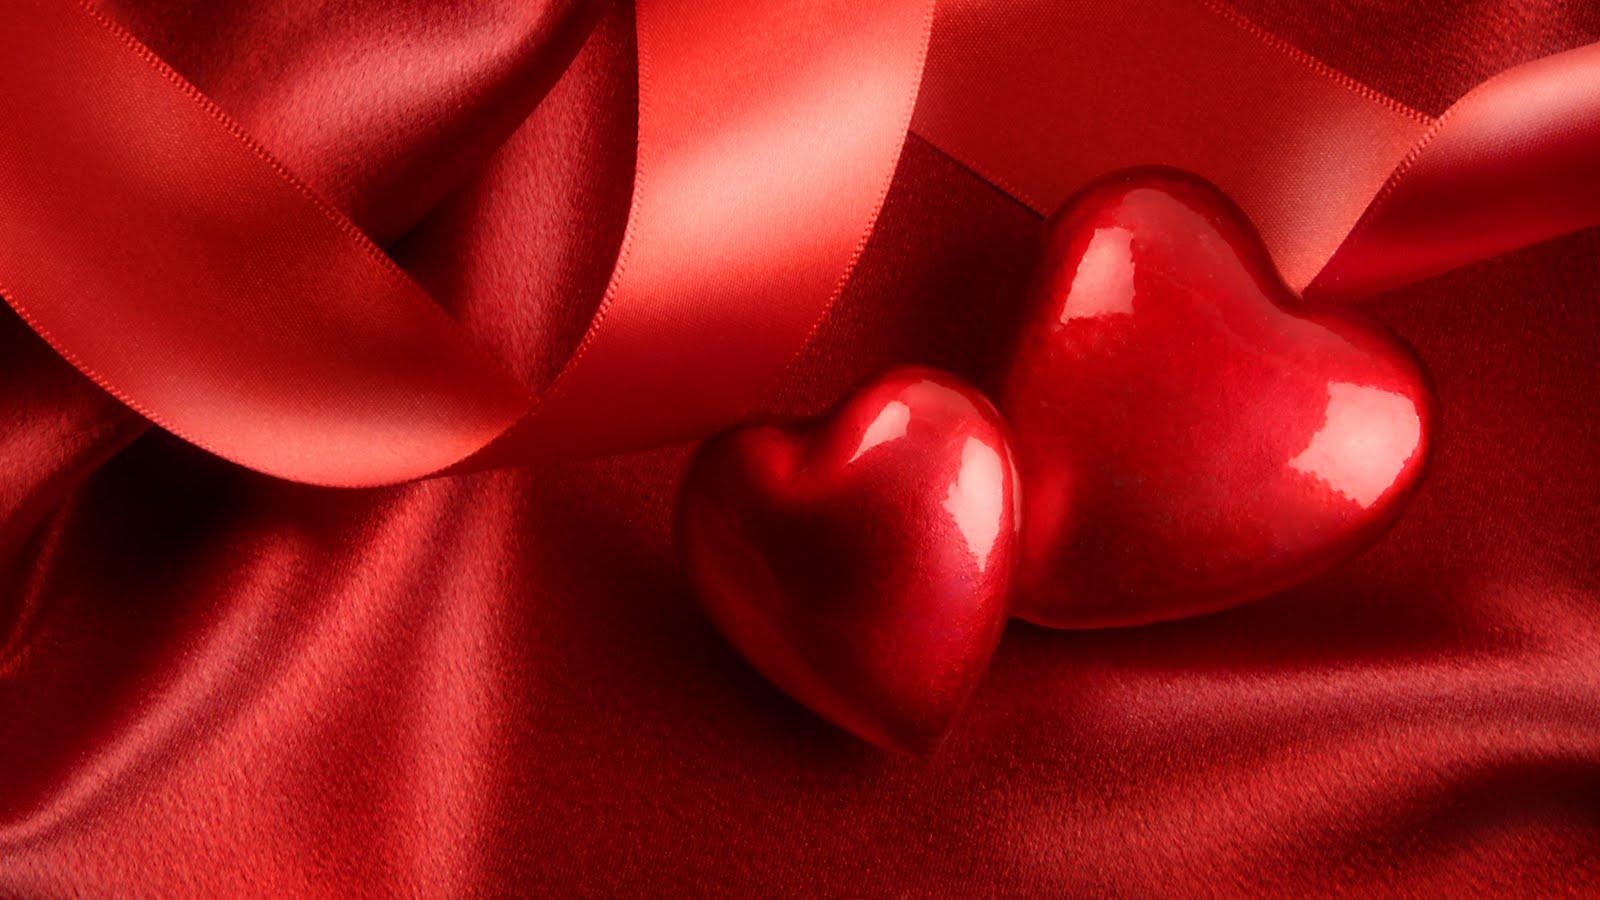 Red Love Wallpaper